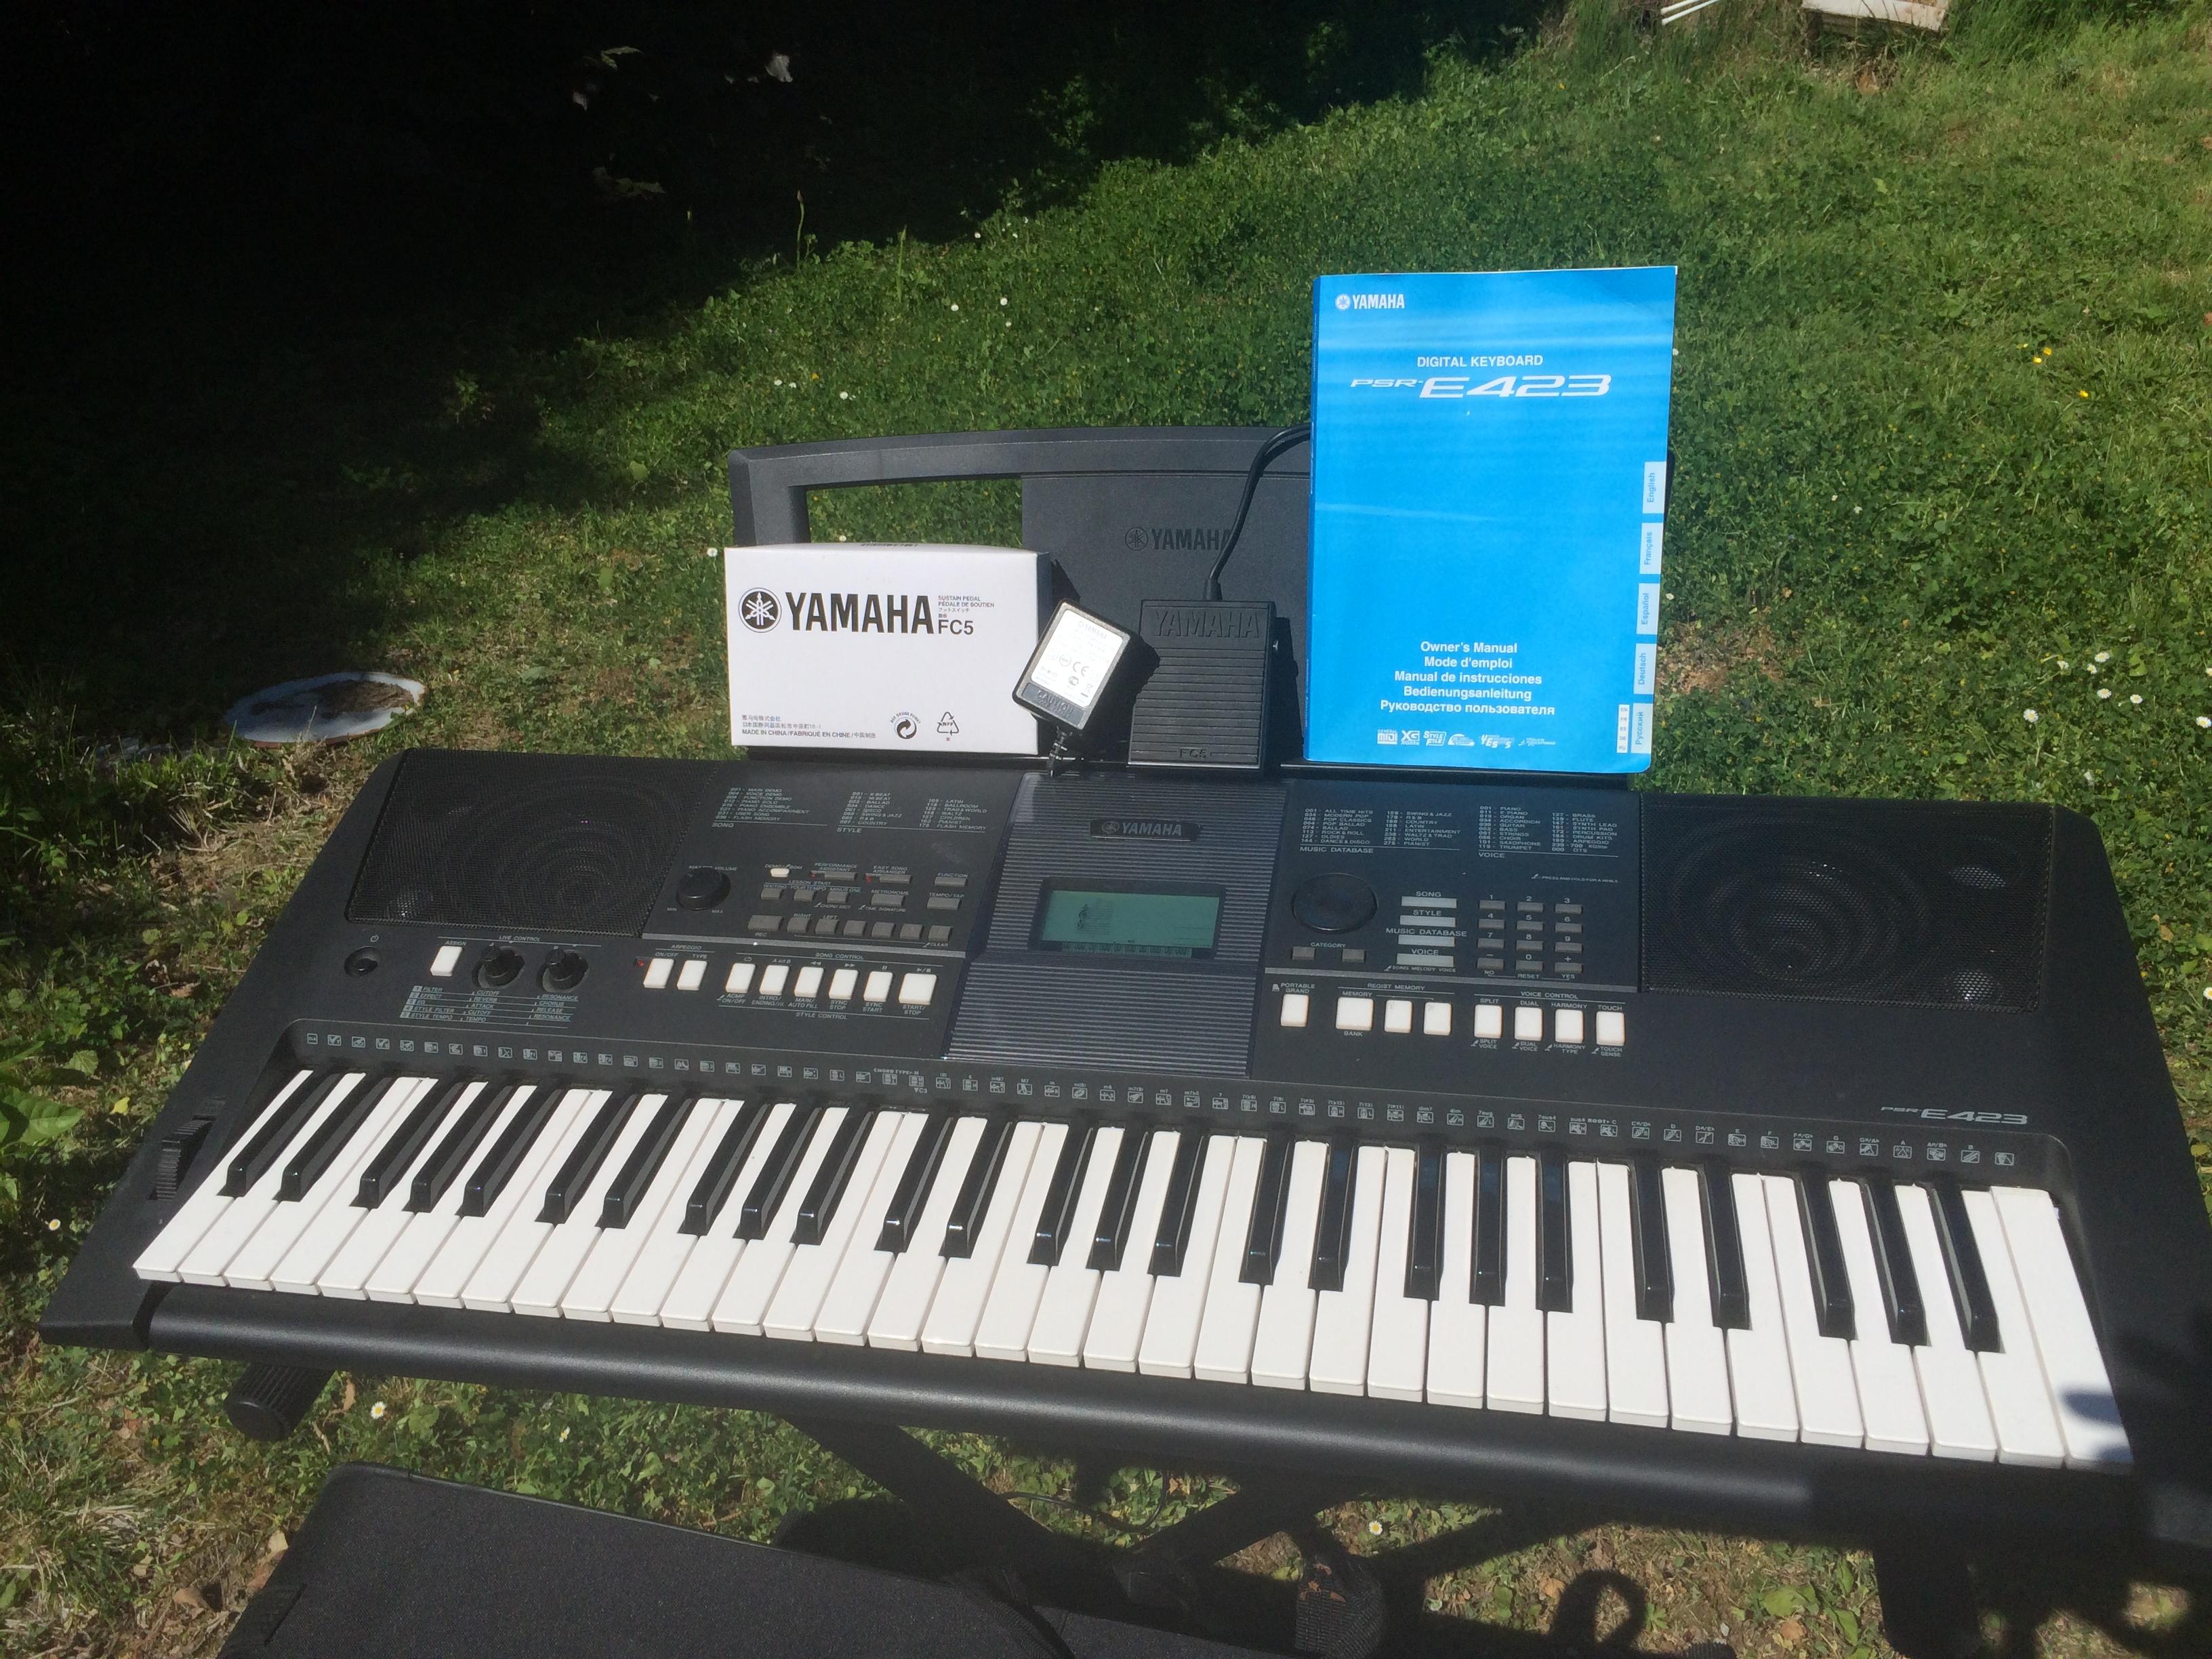 yamaha psr e423 image 1767439 audiofanzine rh en audiofanzine com Yamaha PSR E423 vs E433 Yamaha Keyboards PSR-E423 Accessories